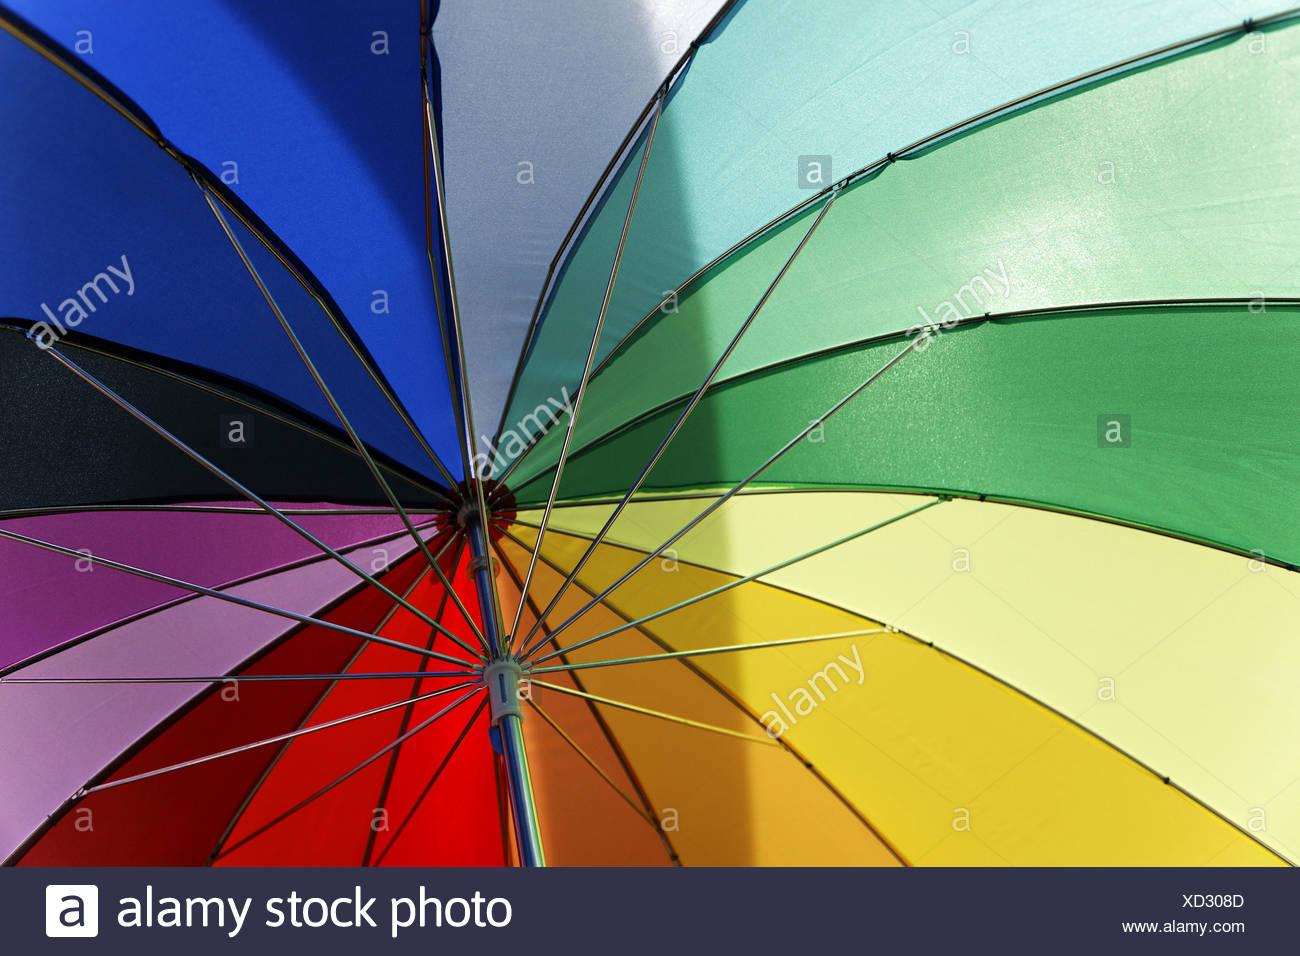 Colorful Umbrella Stock Photos & Colorful Umbrella Stock Images - Alamy